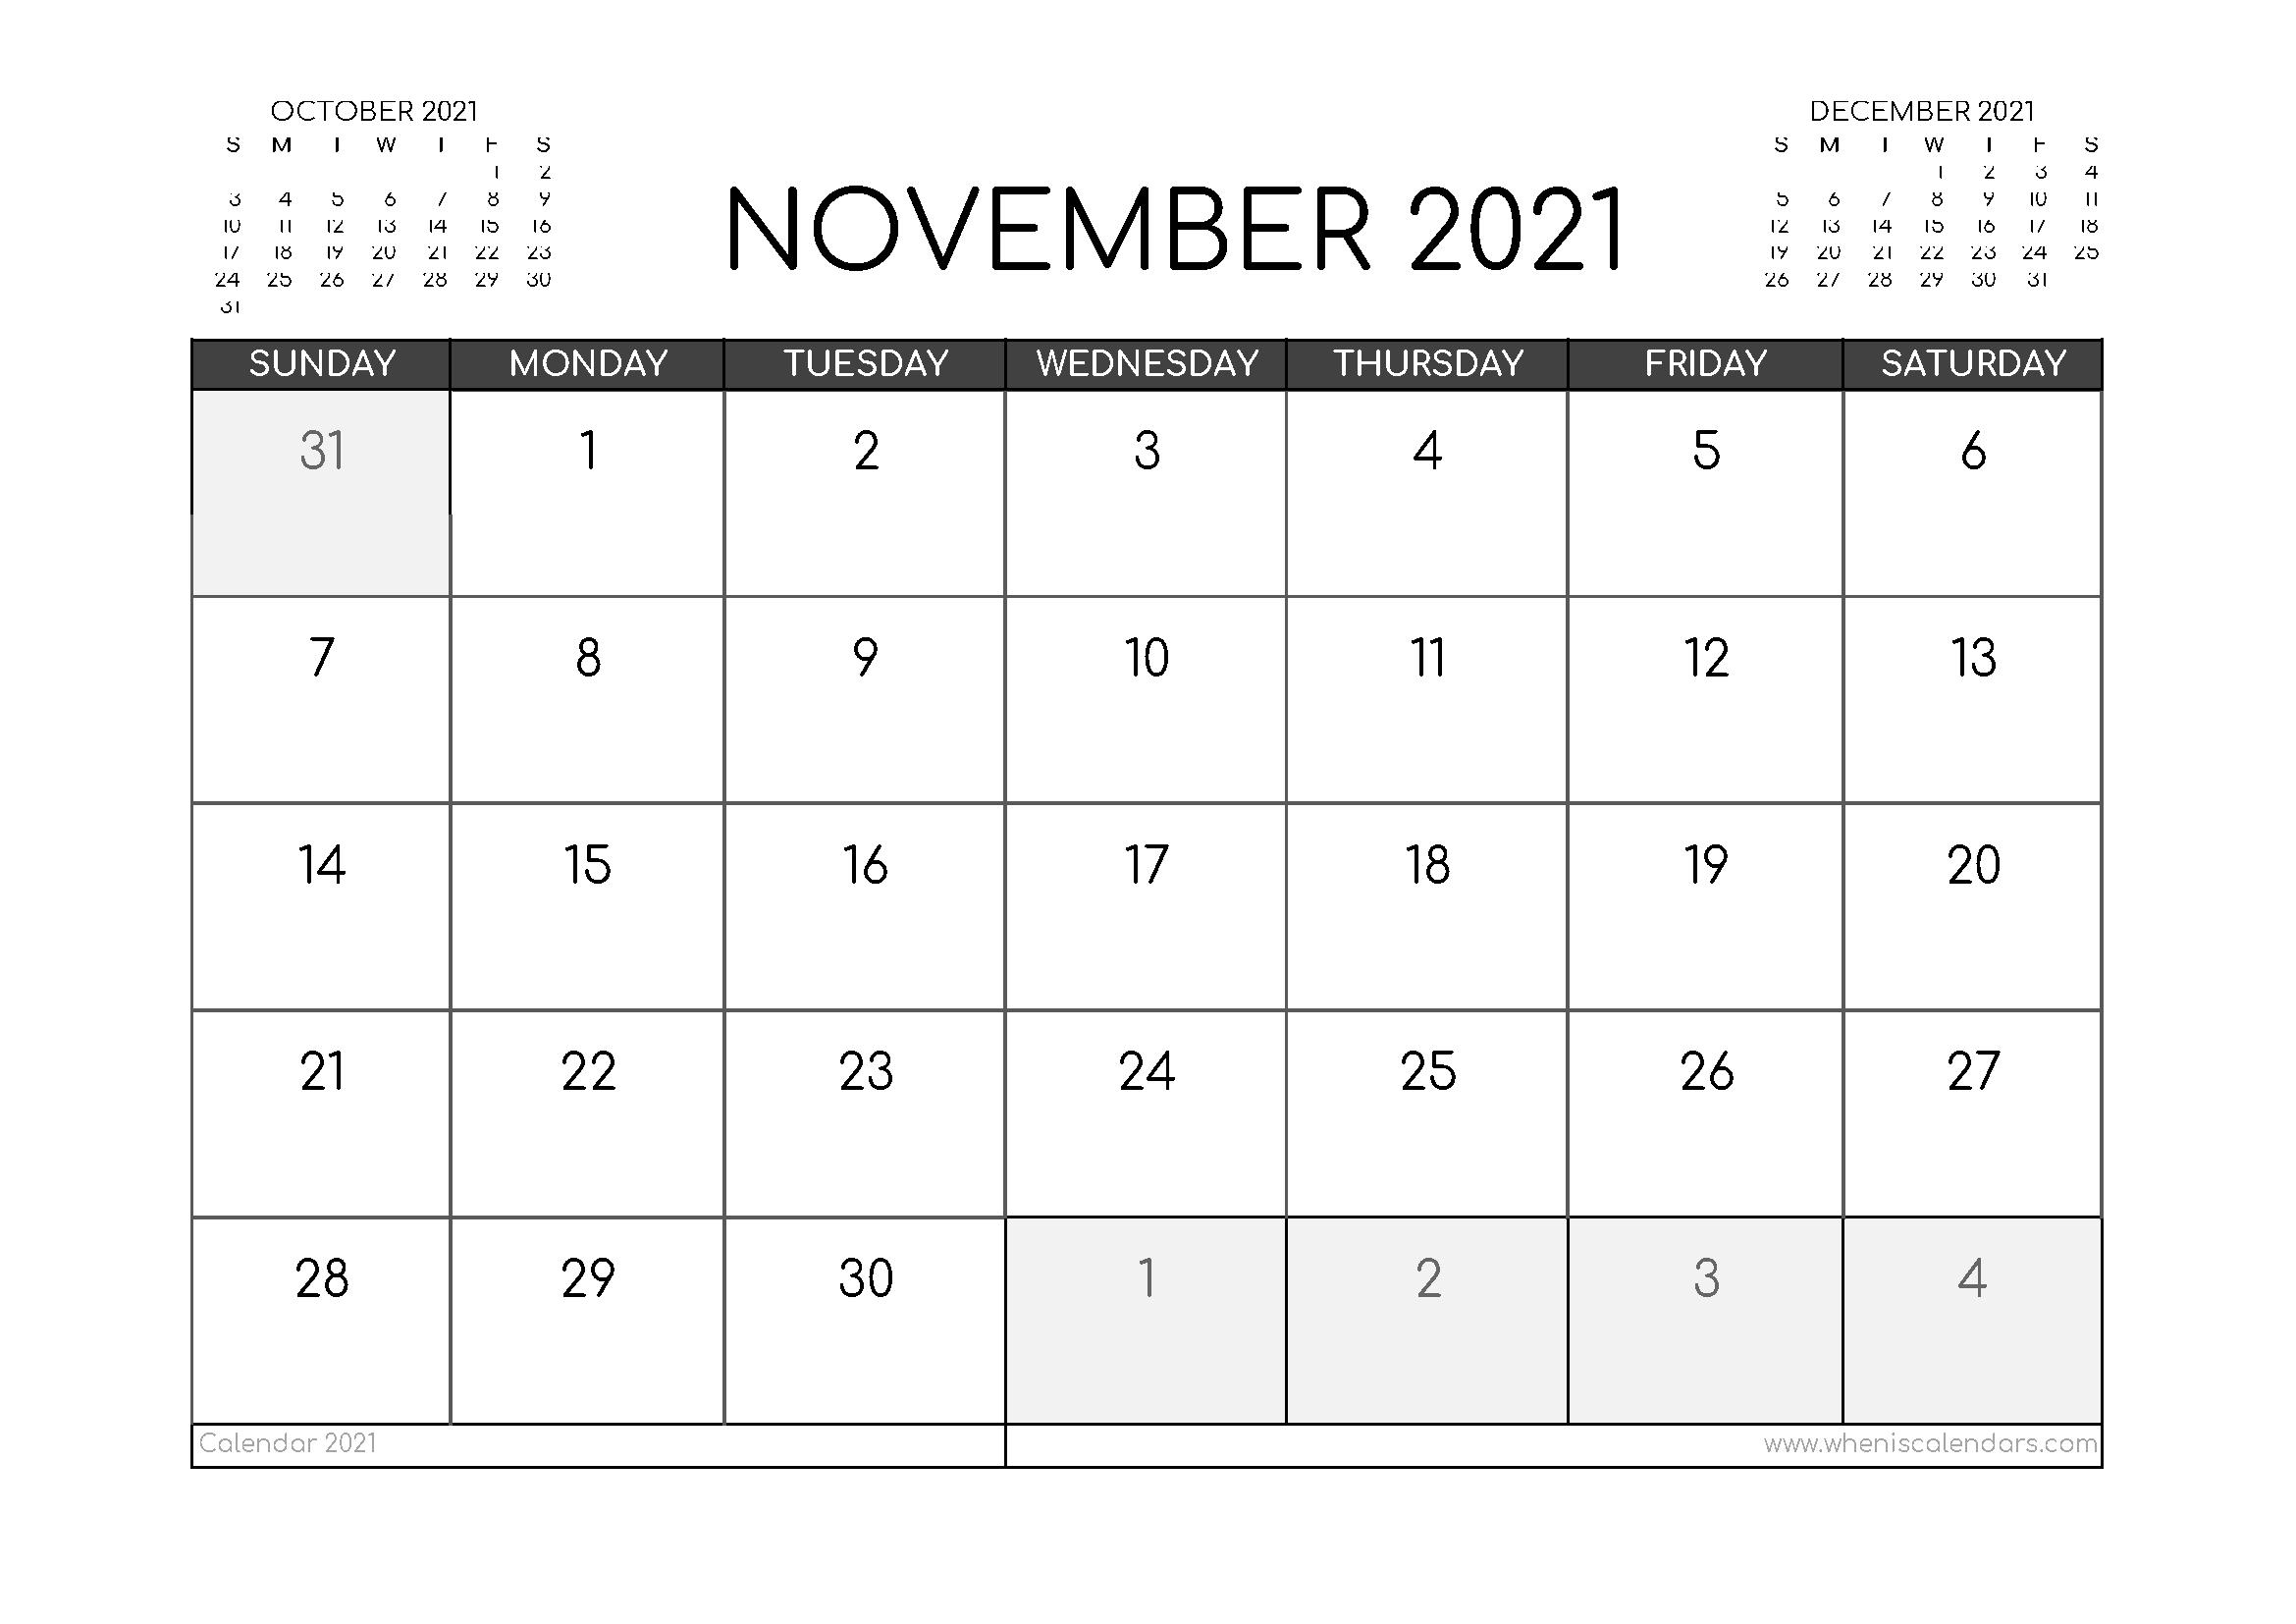 November 2021 Calendar Australia Printable   Free Printable Calendar Printable Calendar For November 2021